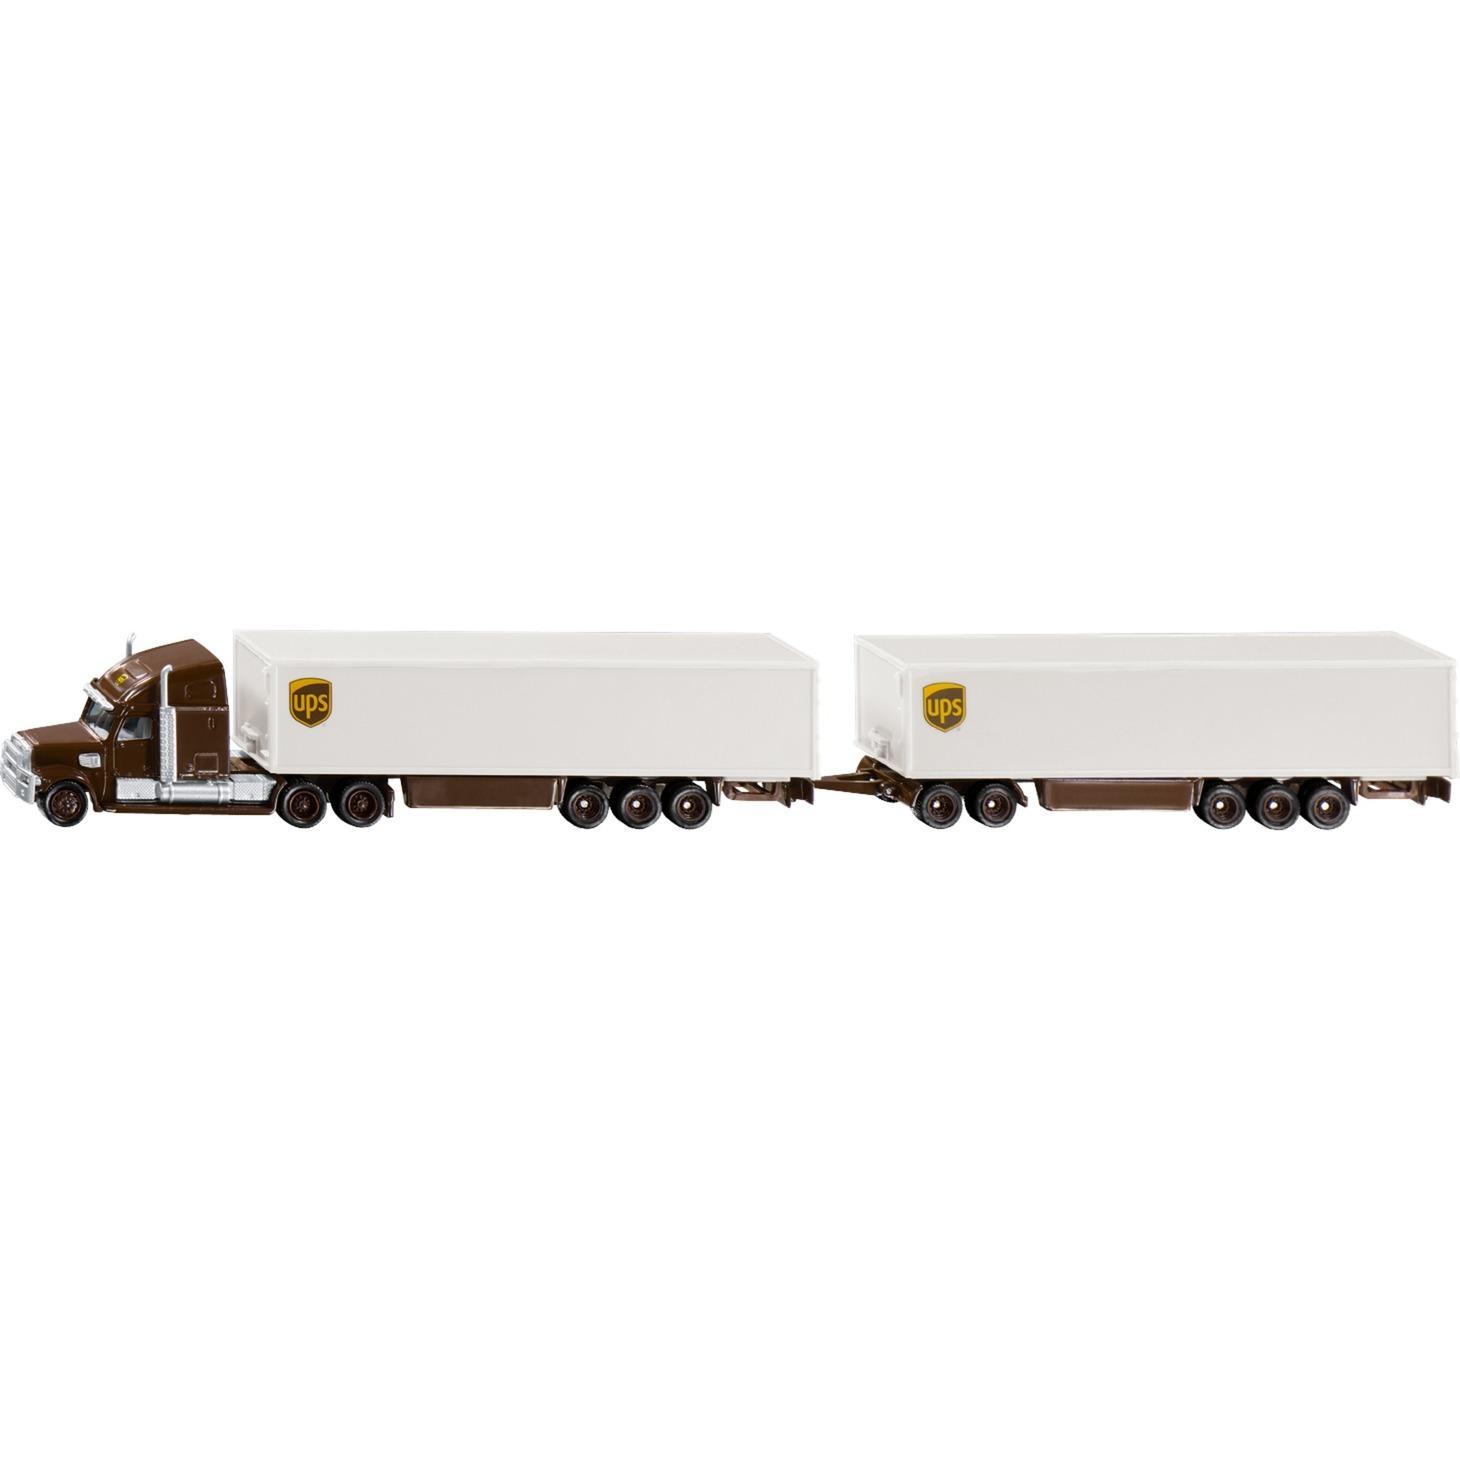 1806 Previamente montado Modelo a escala de tren de carretera 1:87 modelo de vehículo de tierra, Automóvil de construcción